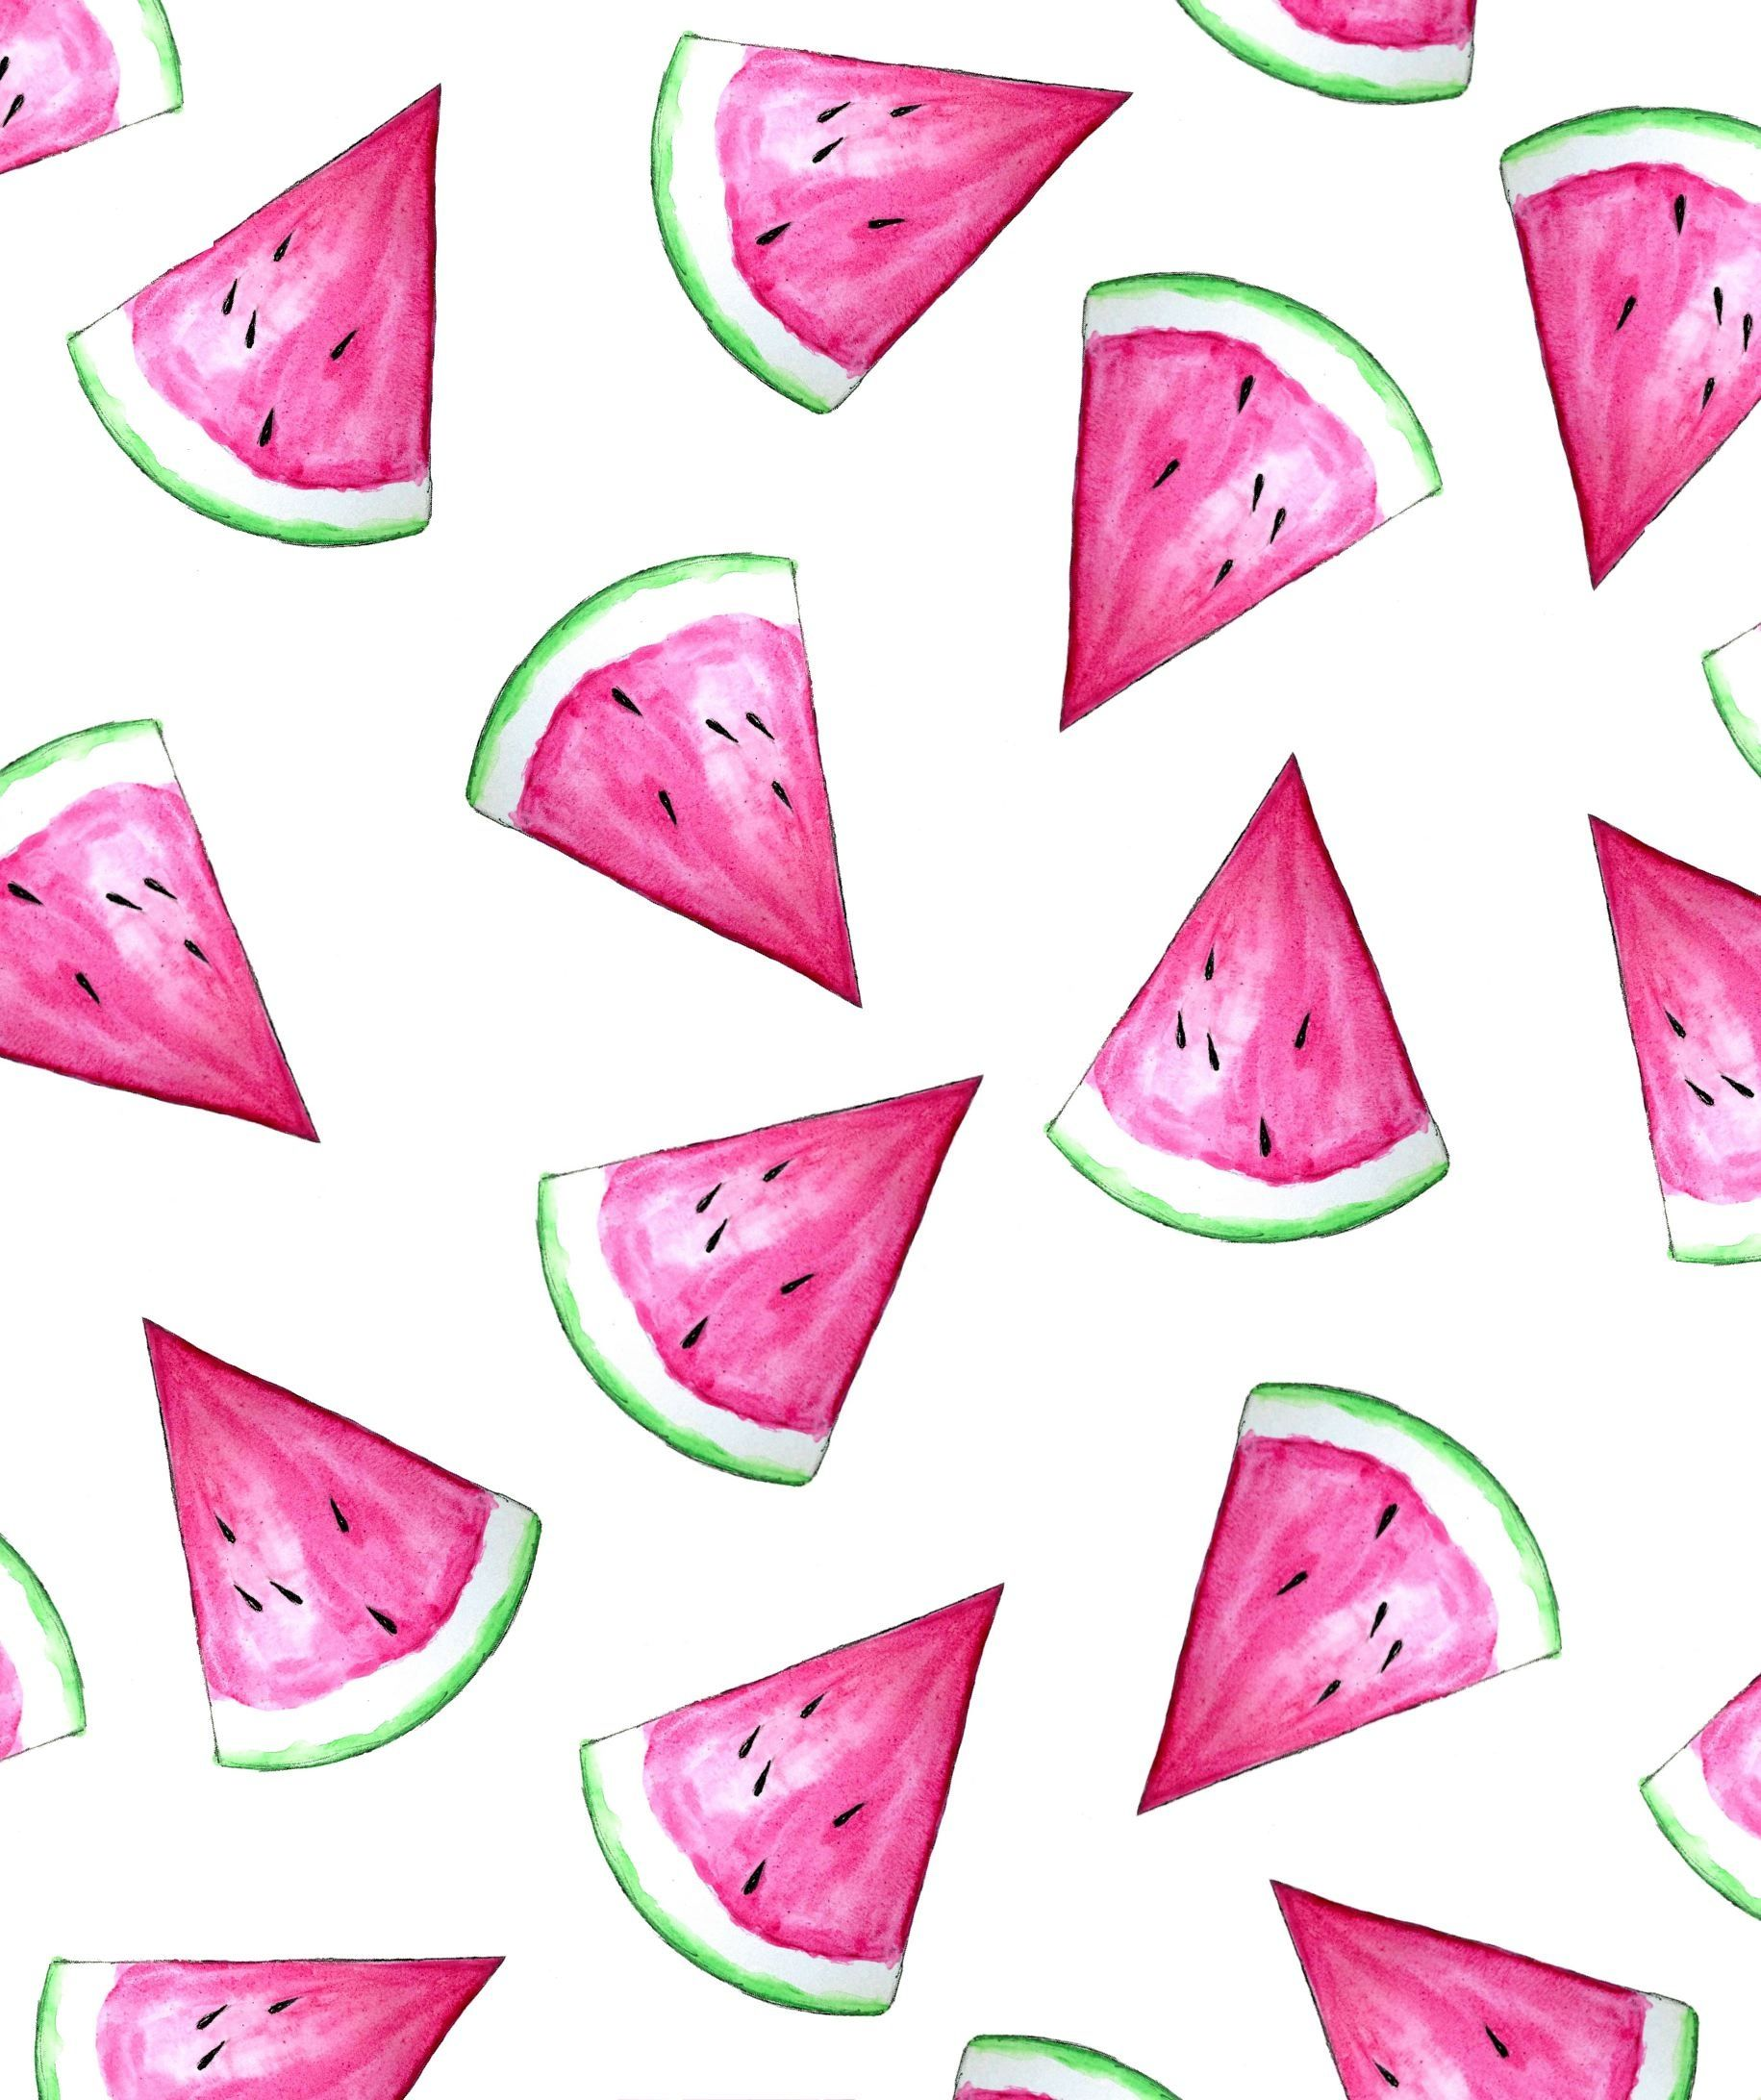 Many Watermelons Watermelon Wallpaper Flamingo Illustration Iphone Wallpaper